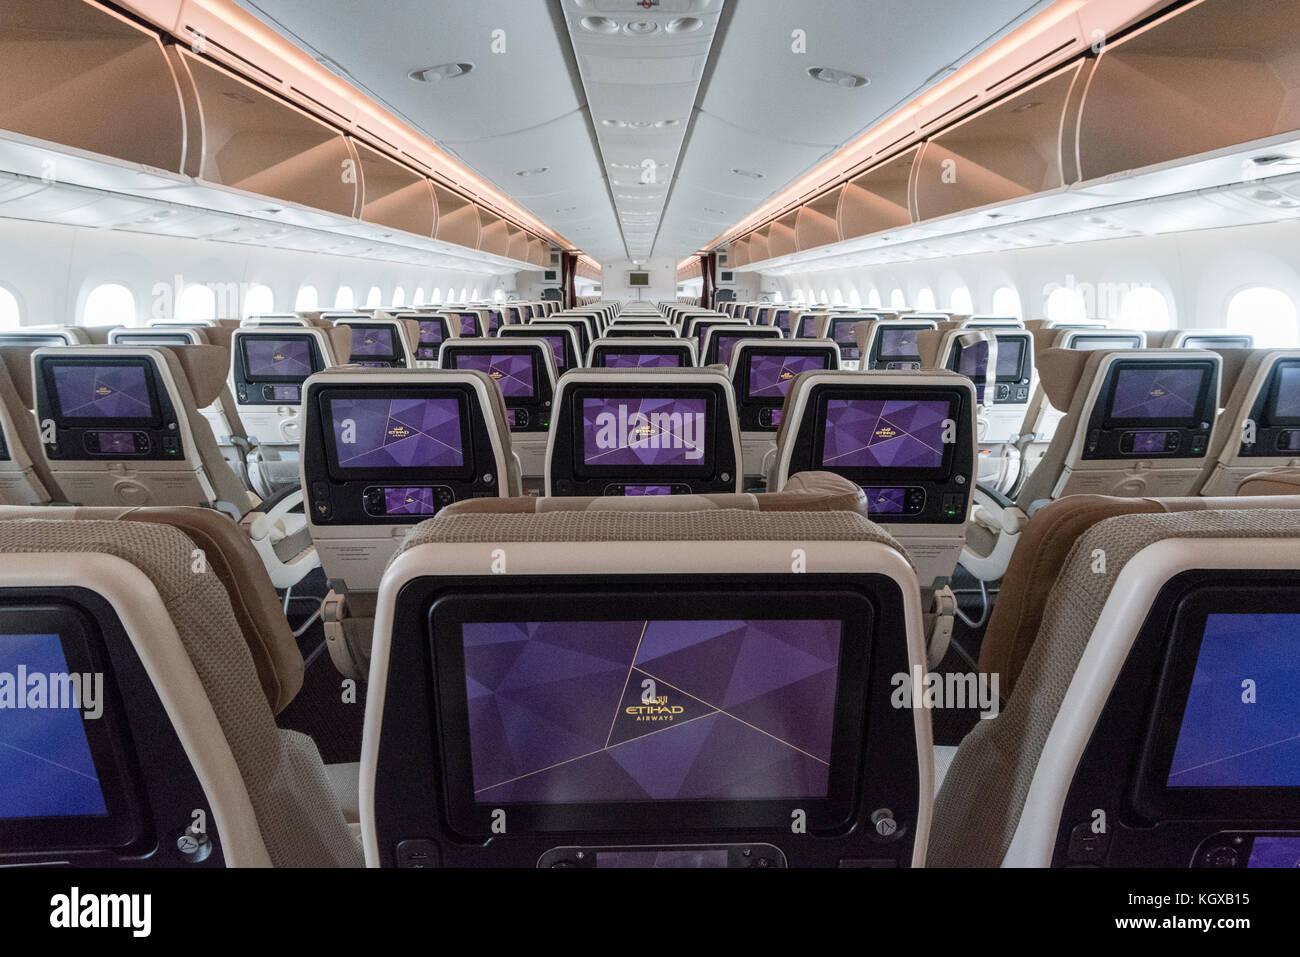 https://c8.alamy.com/comp/KGXB15/etihad-airways-aircraft-cabin-interior-boeing-787-KGXB15.jpg